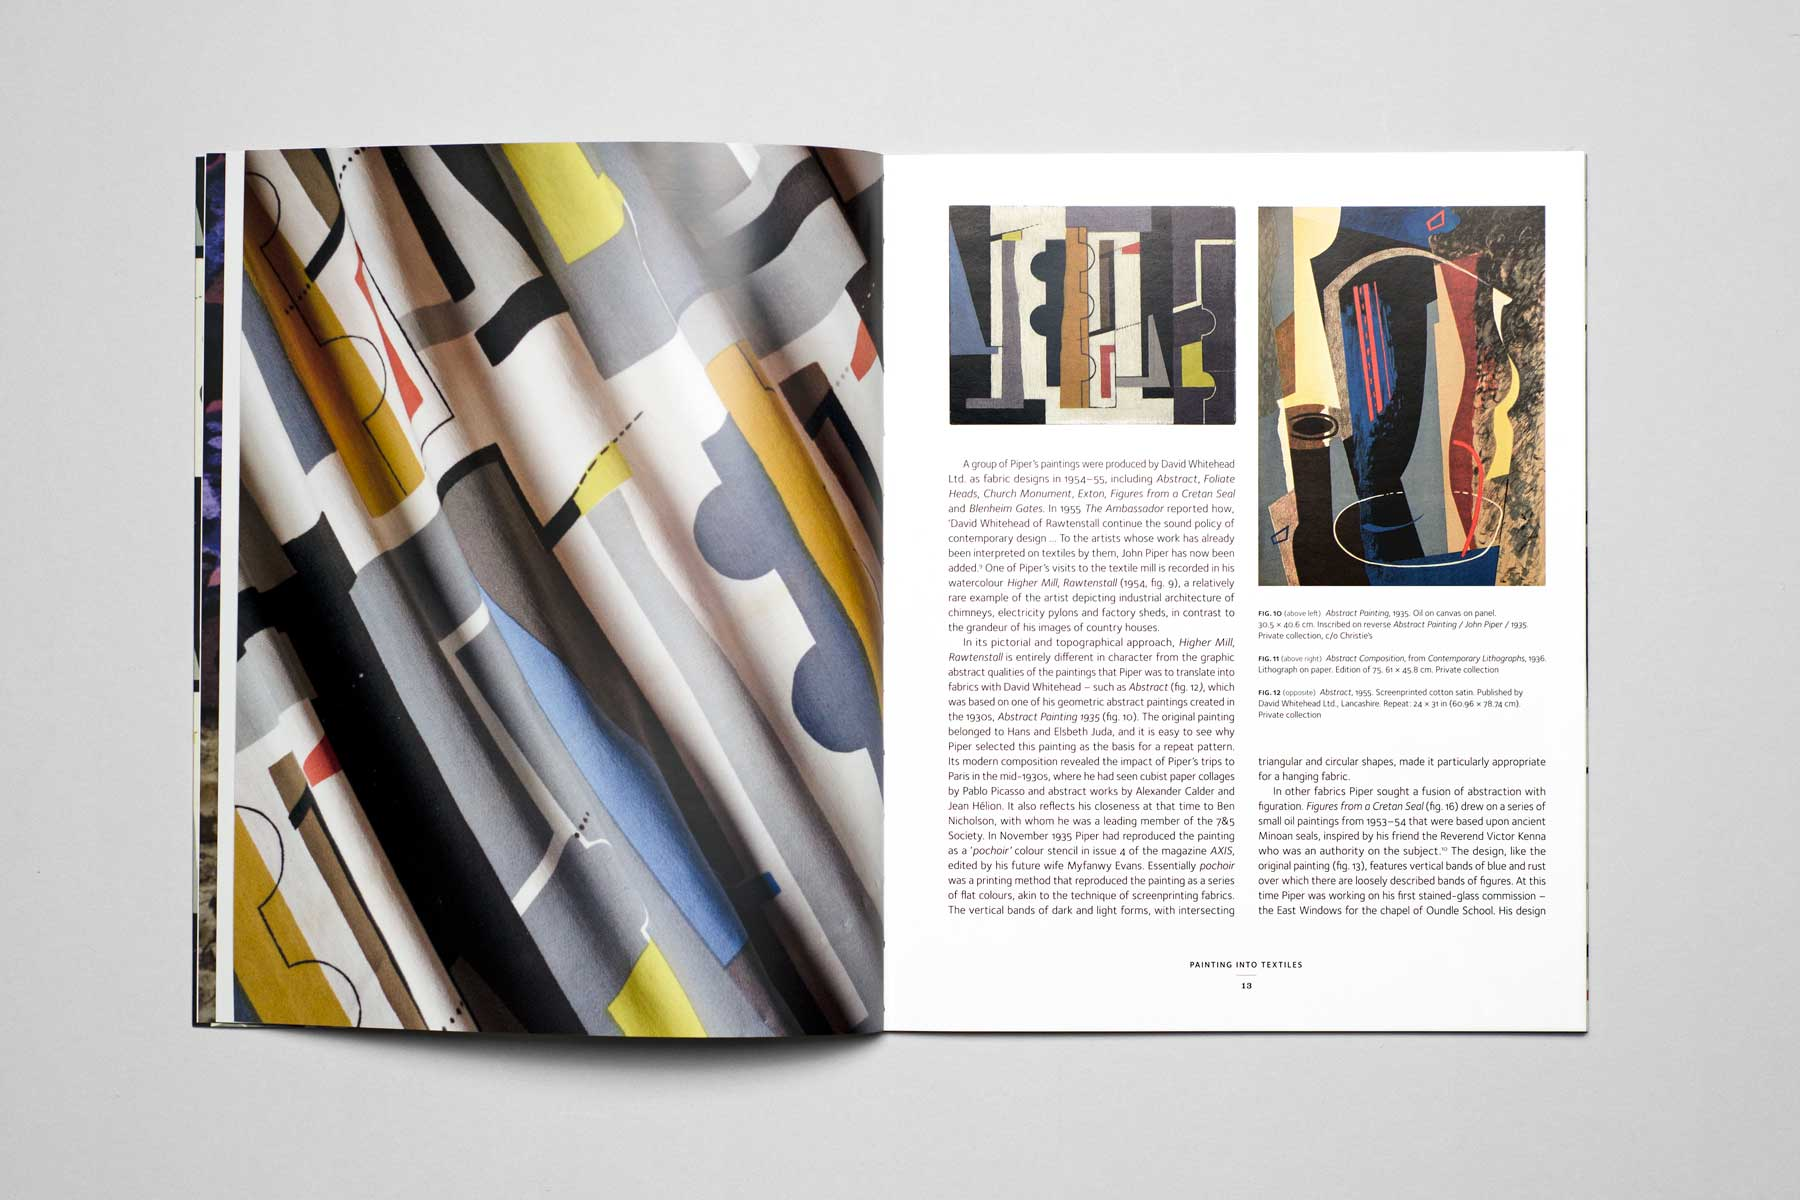 John Piper: The Fabric of Modernism